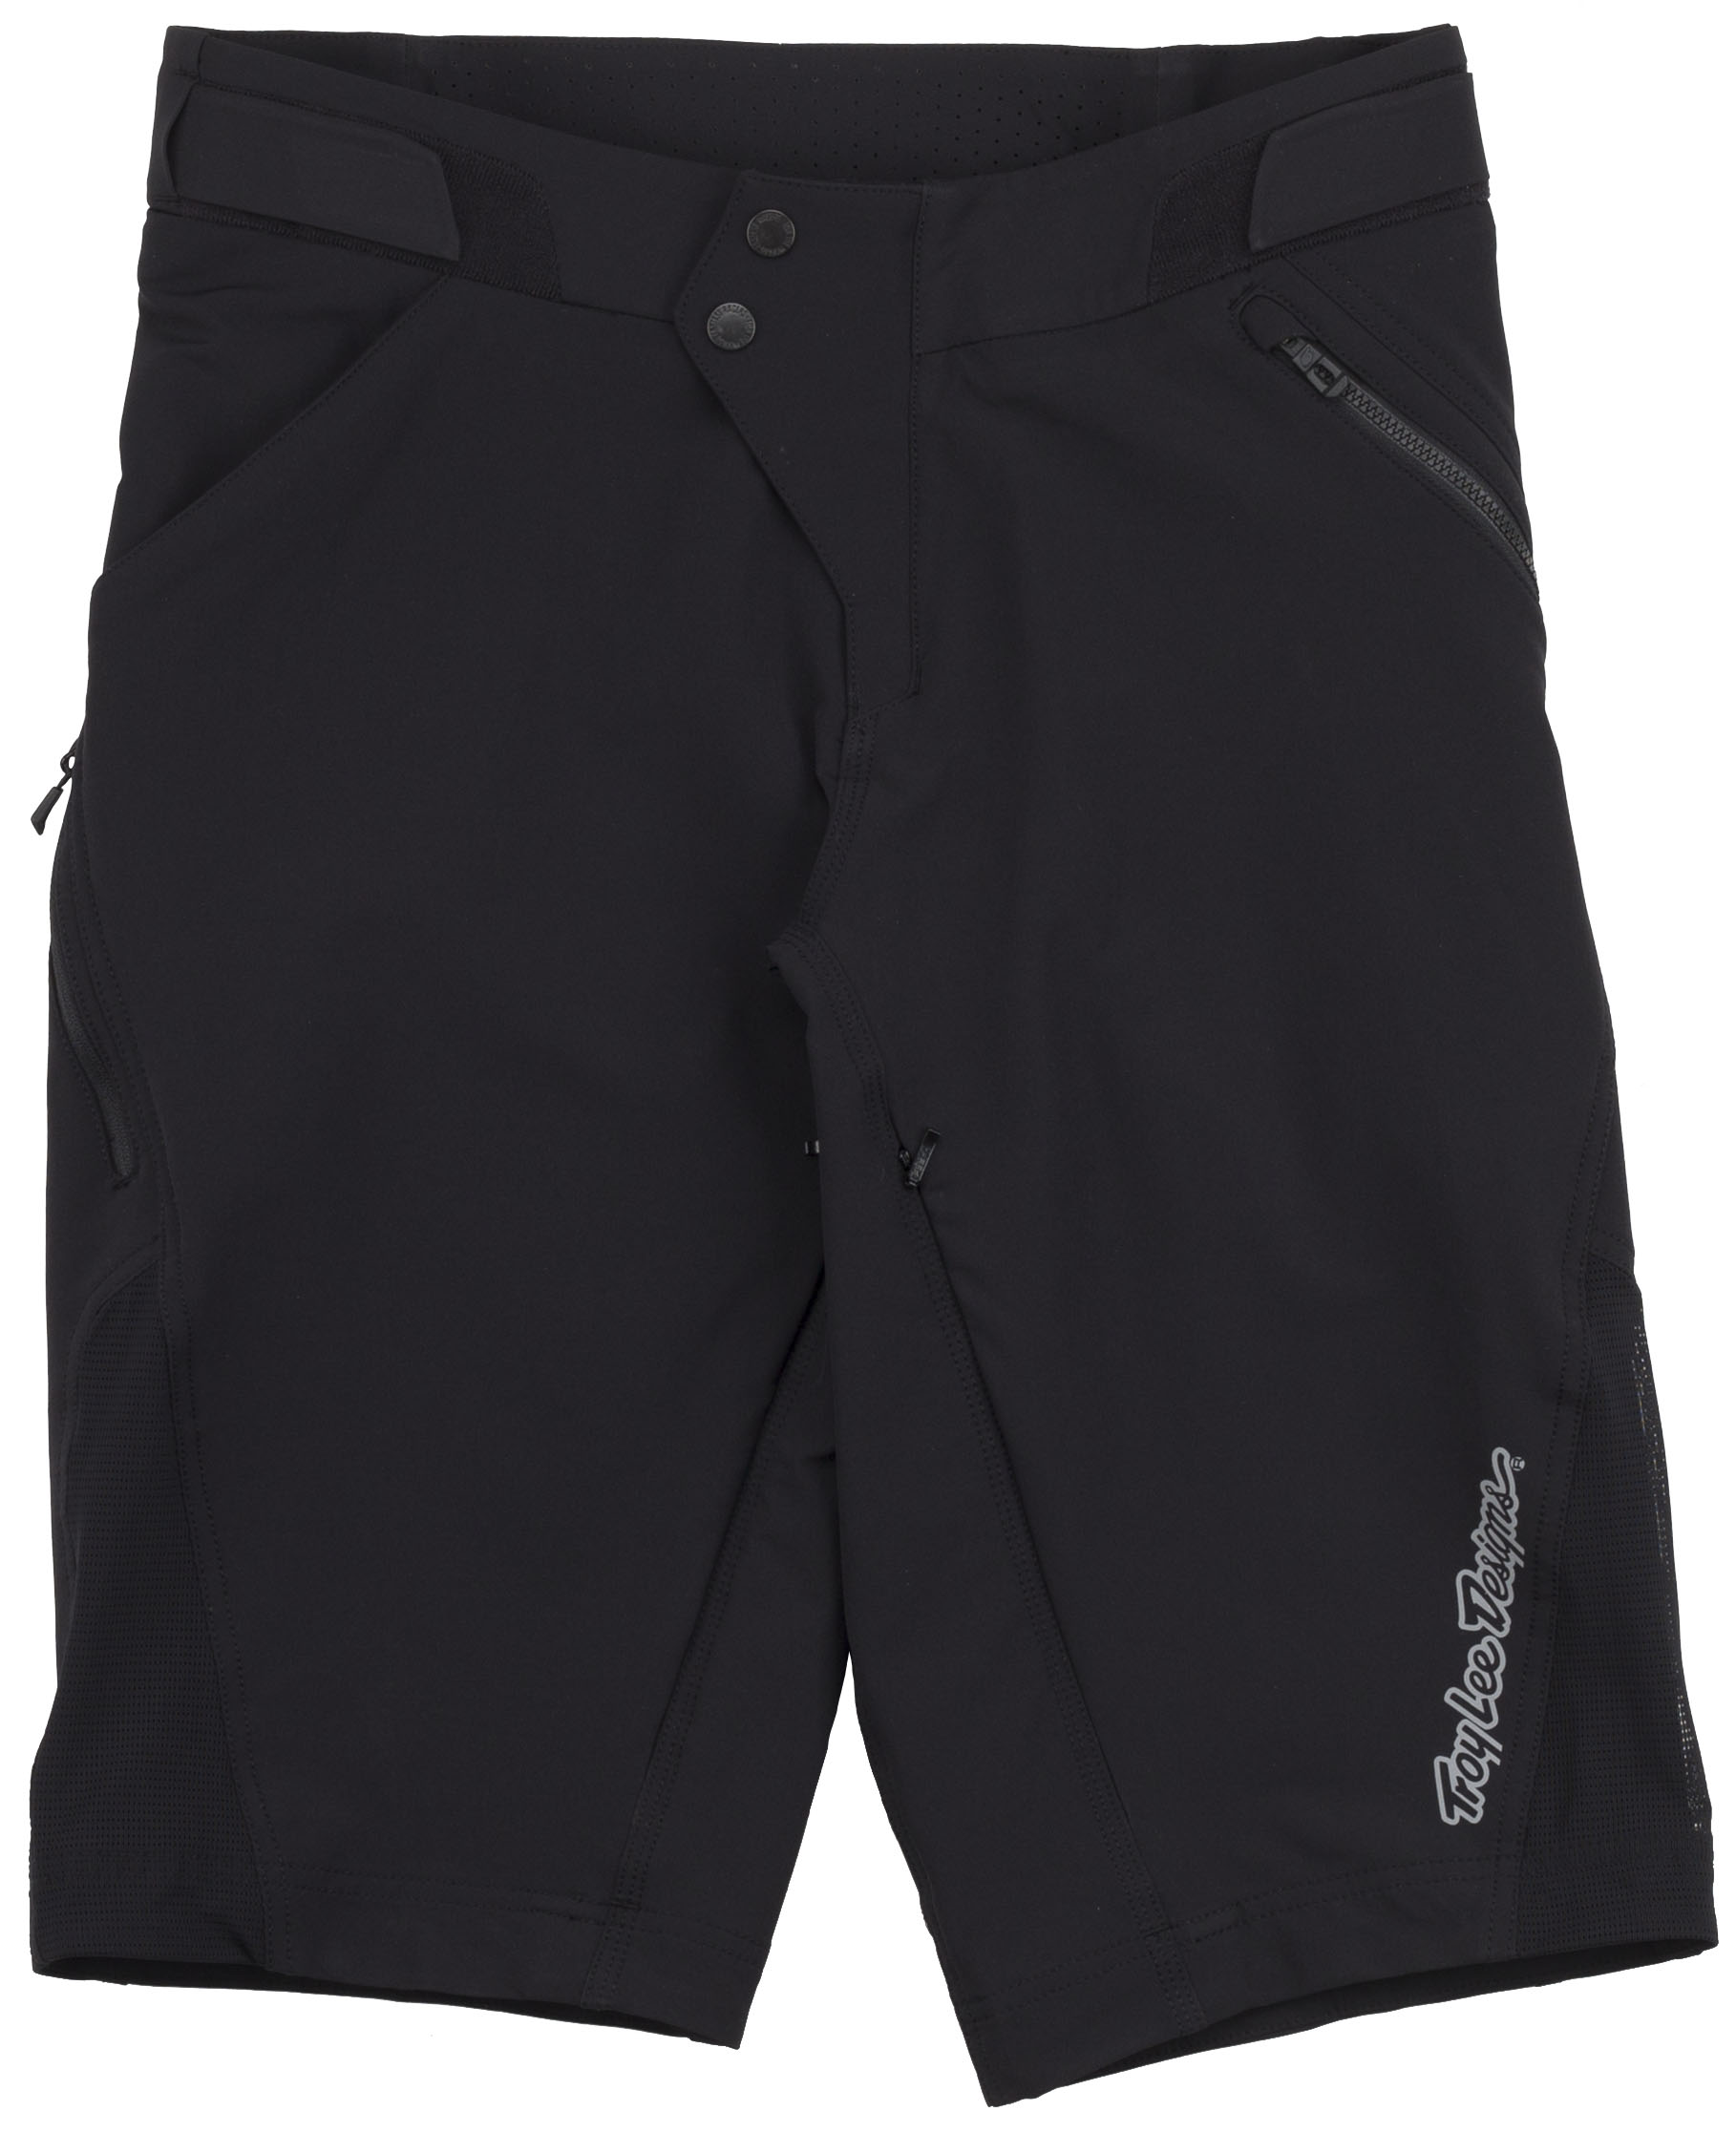 42f1c608c88 Troy Lee Designs Ruckus MTB Shorts | Jenson USA